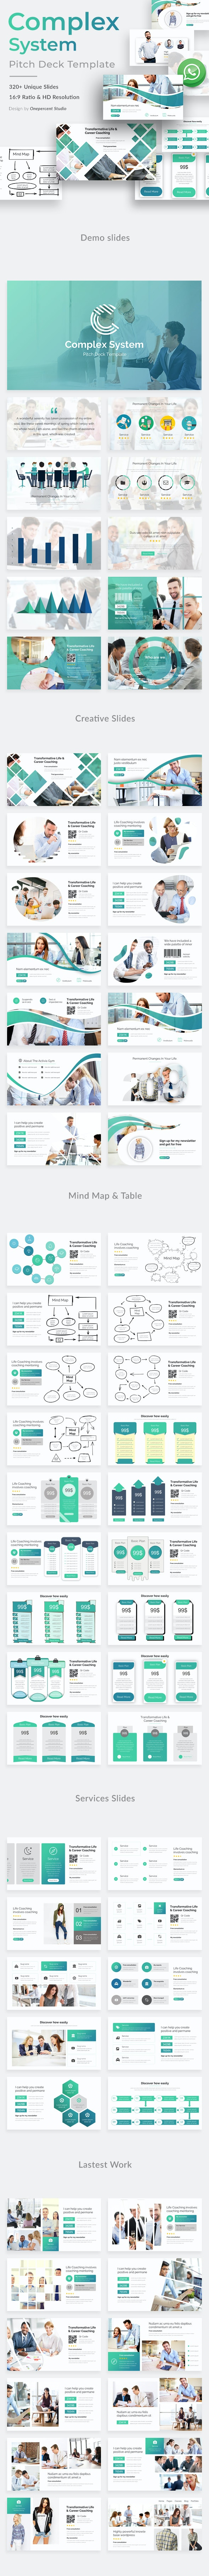 Complex System Pitch Deck Google Slide Template - Google Slides Presentation Templates